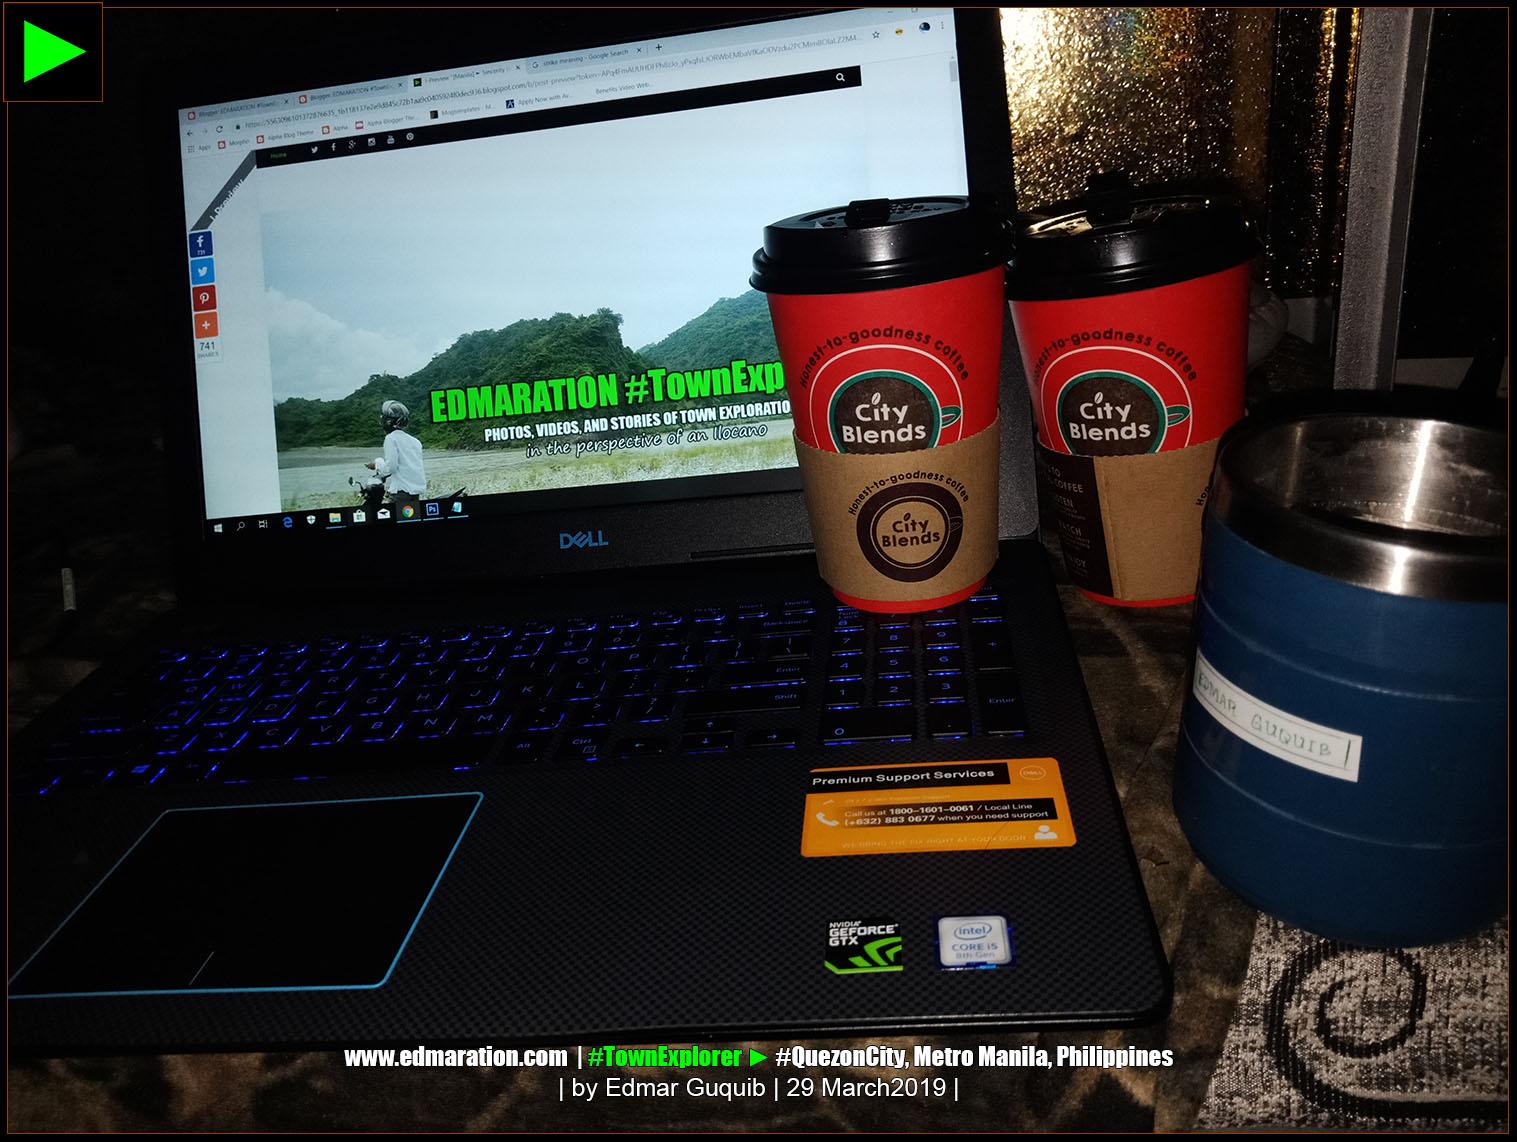 7-11 city blends coffee